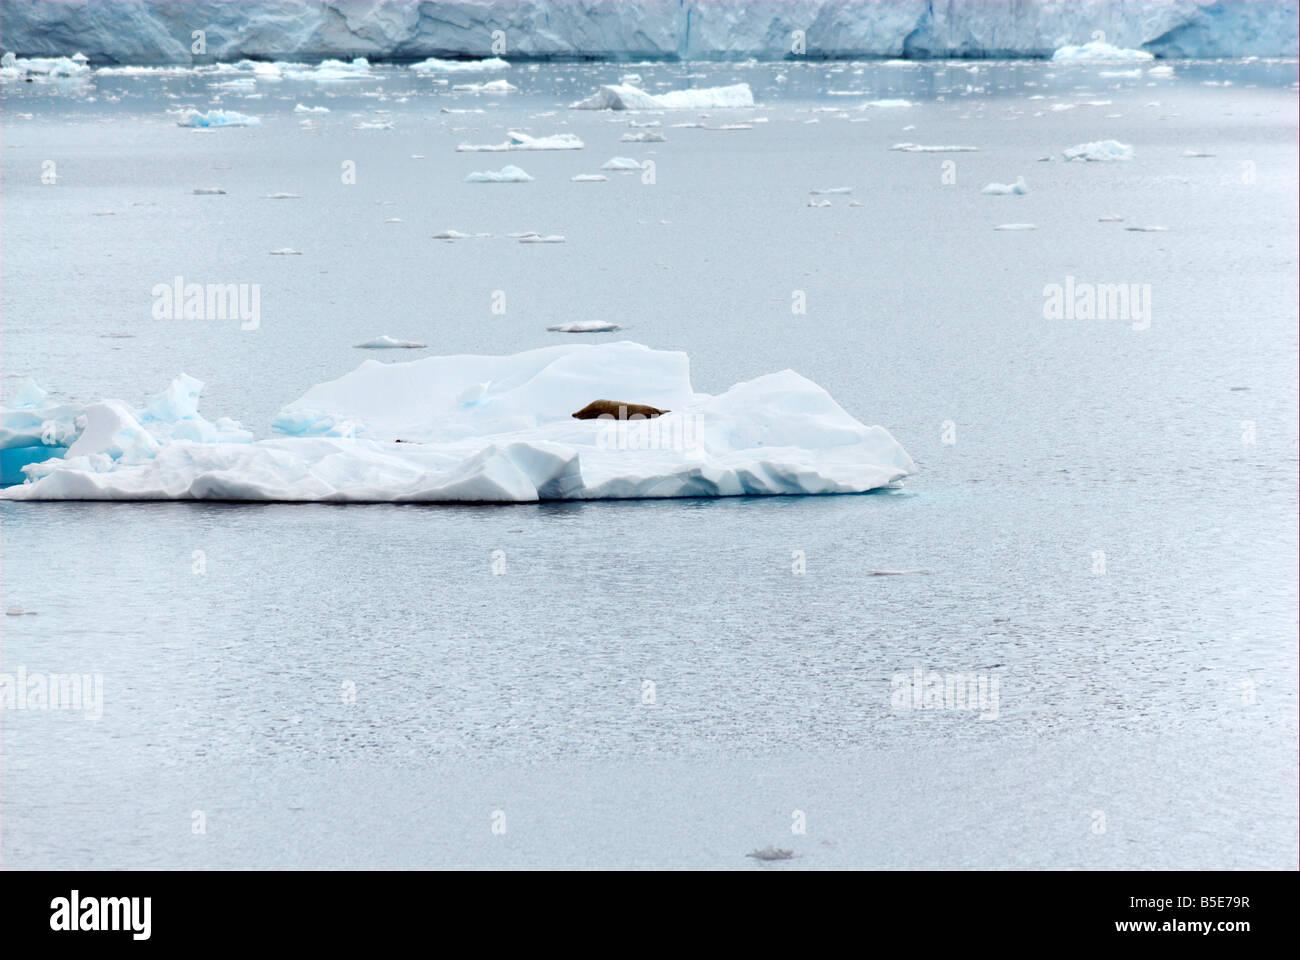 Seal lying on an iceberg - Stock Image